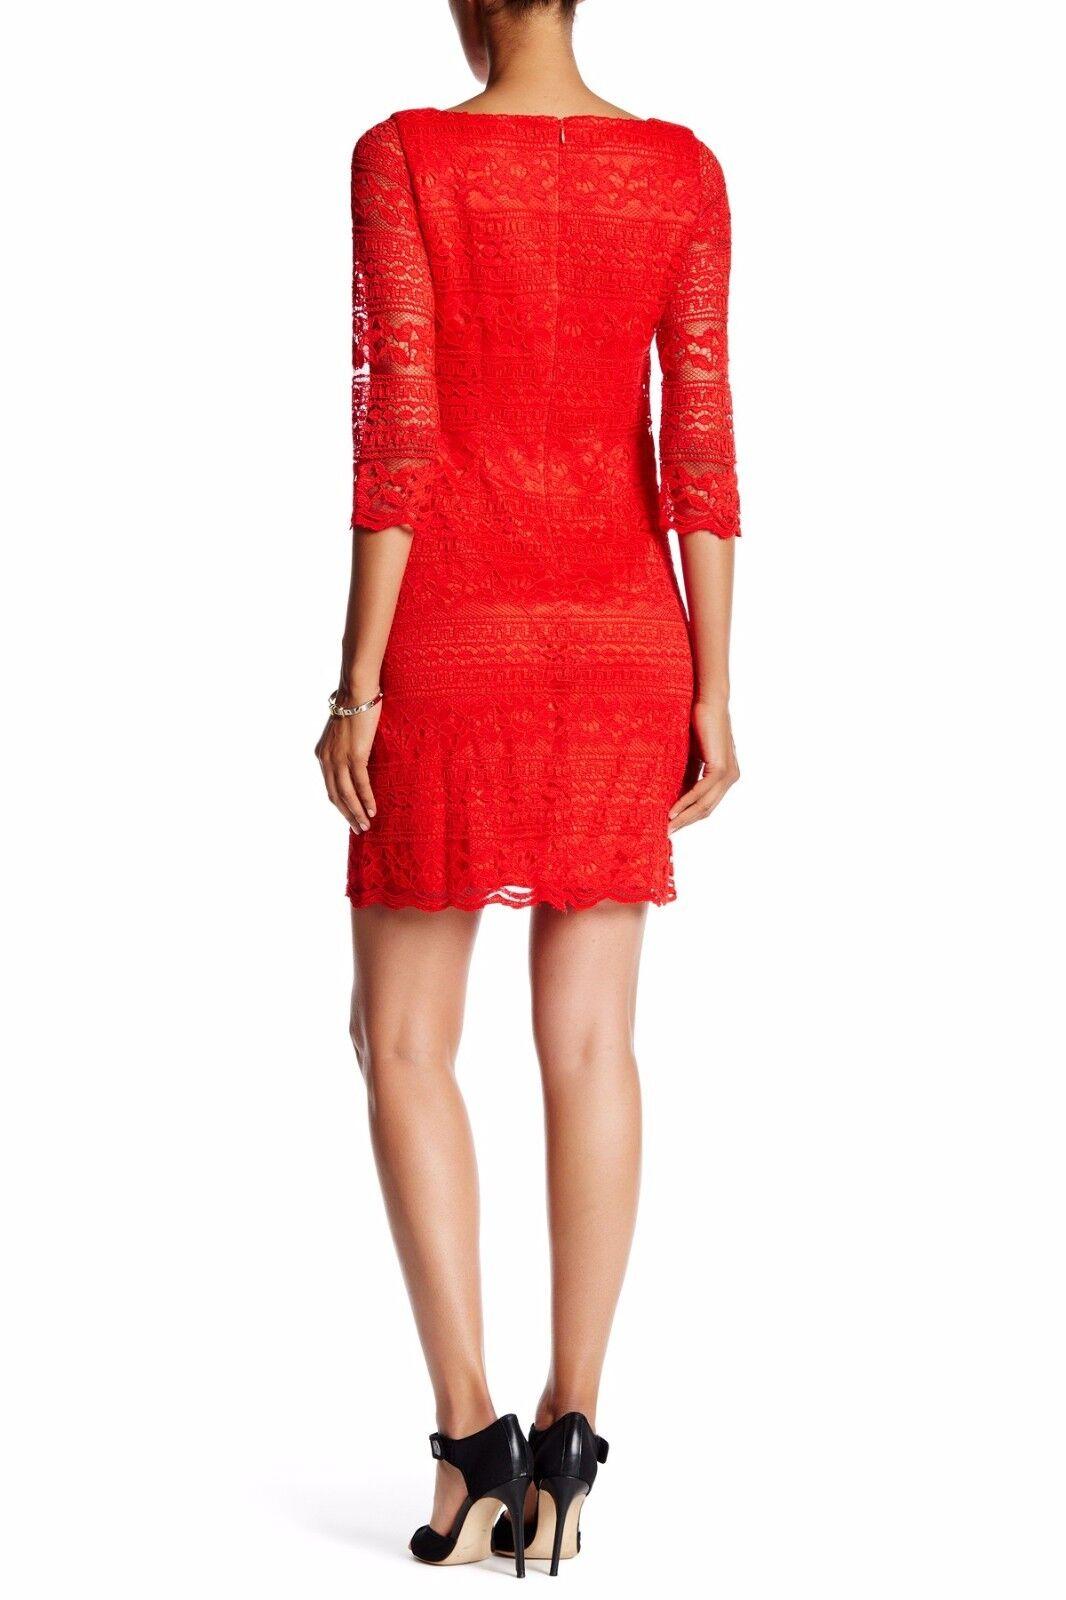 Eliza Eliza Eliza J 3 4 Length Sleeve Sheath Dress (size 14 ) e15cbe